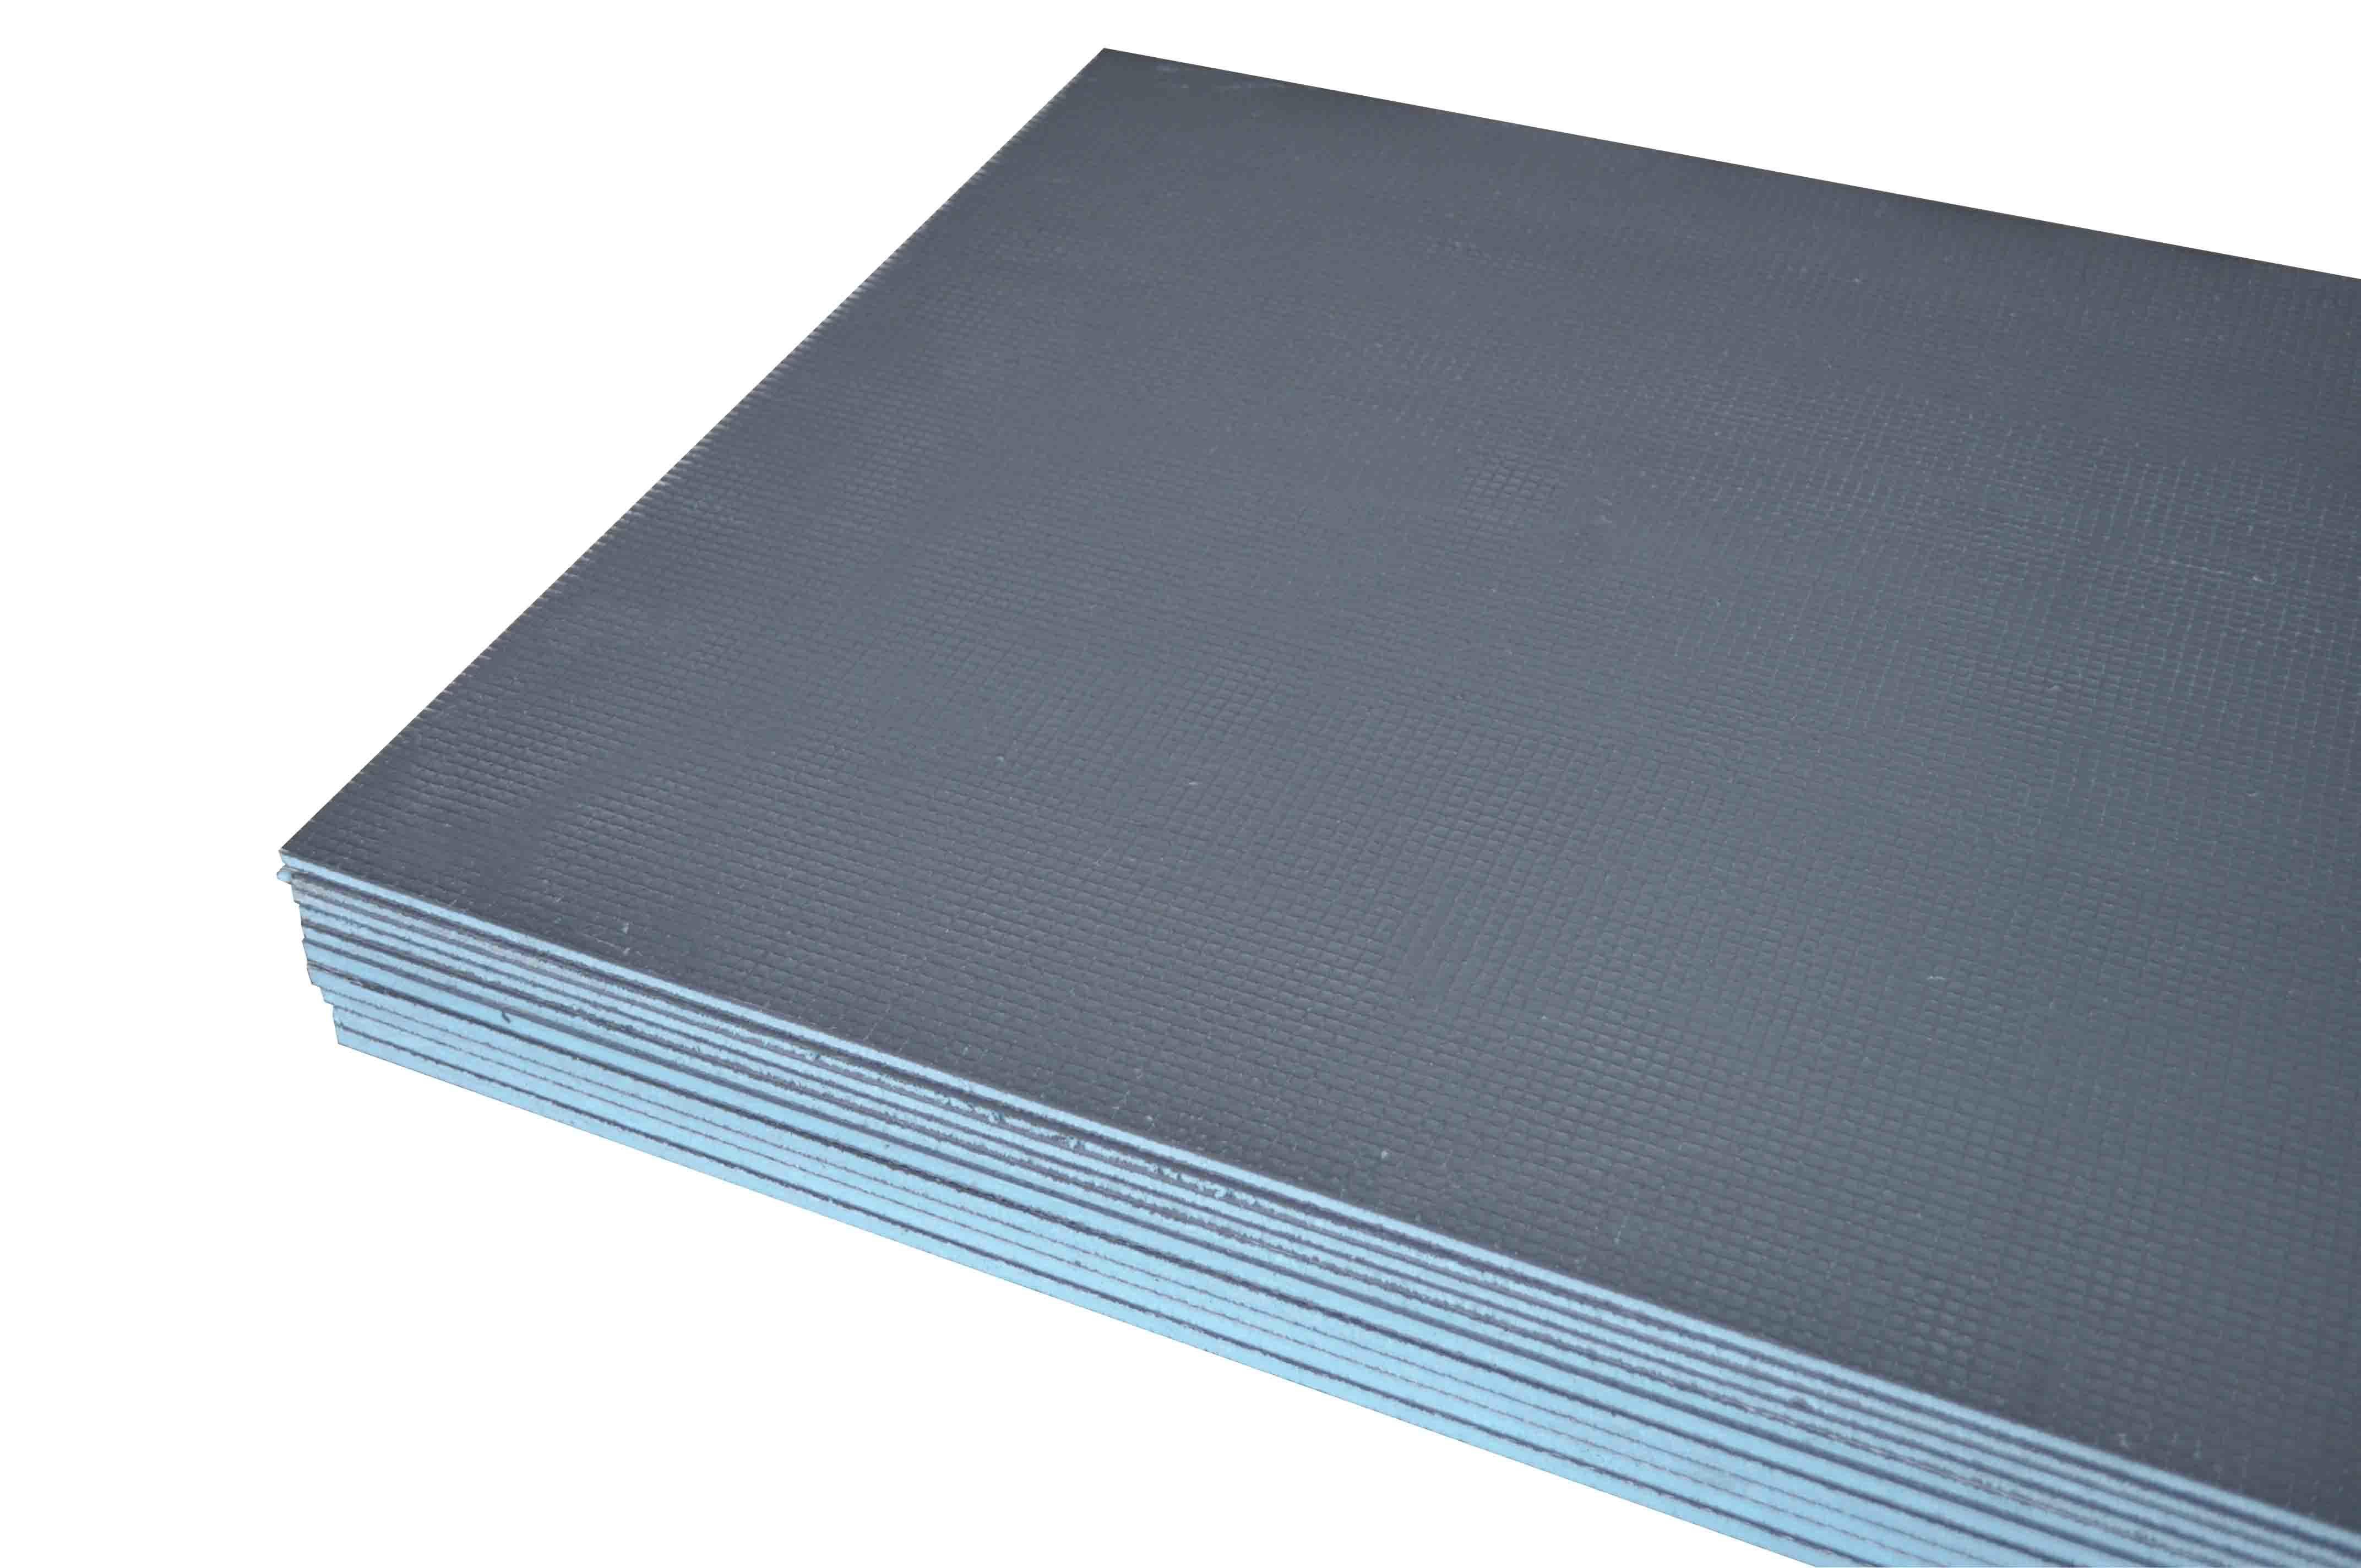 China Extruded Polystyrene Insulation Board (XPS) Fire Retardant Panel -  China XPS Tile Backer Board, Tile Backer Board